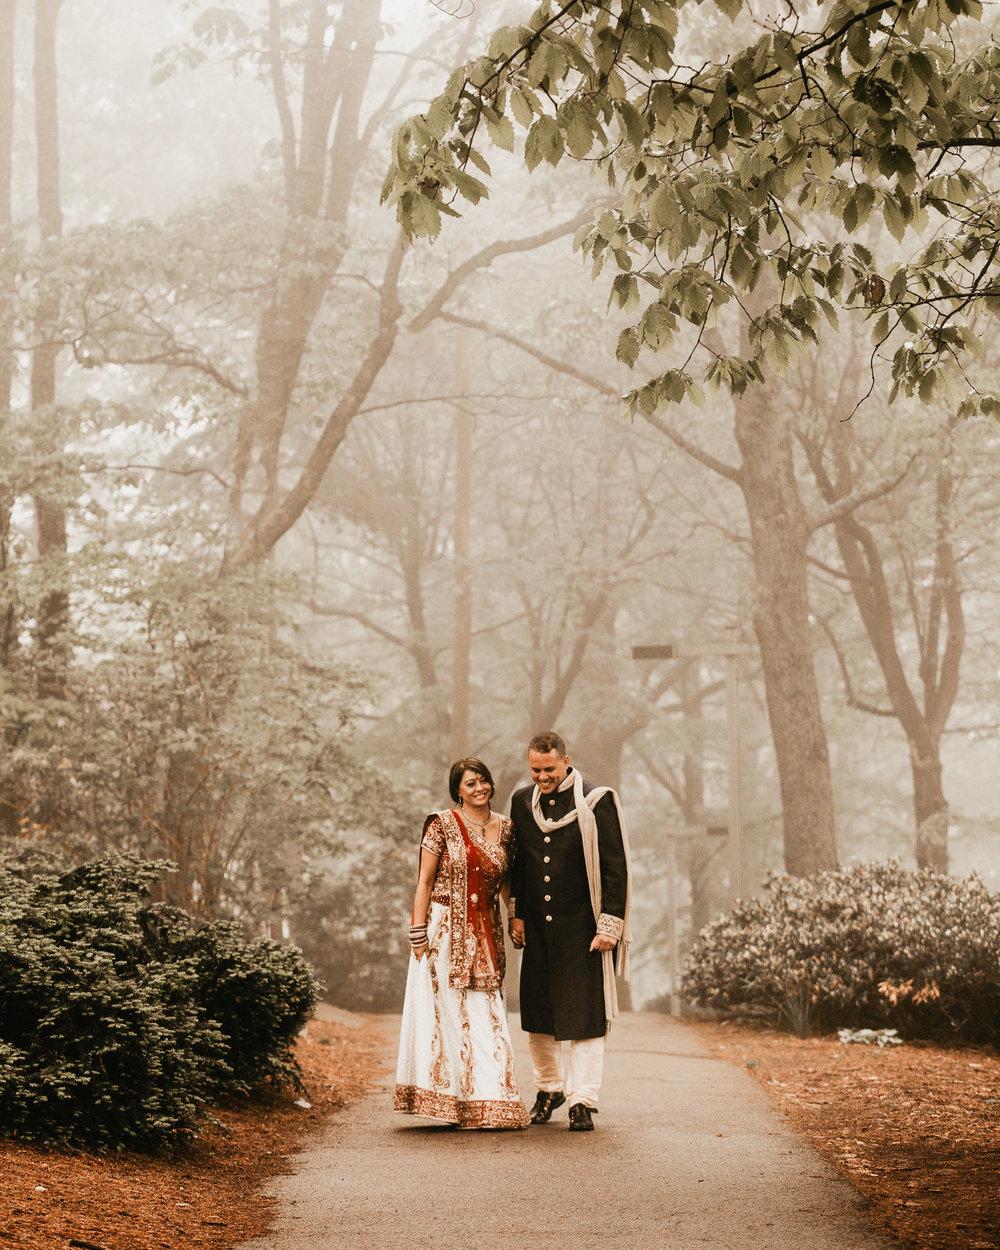 Roanoke - Indian Weddings - Best Wedding Photographers - Virginia - Pat Cori Photography.jpg